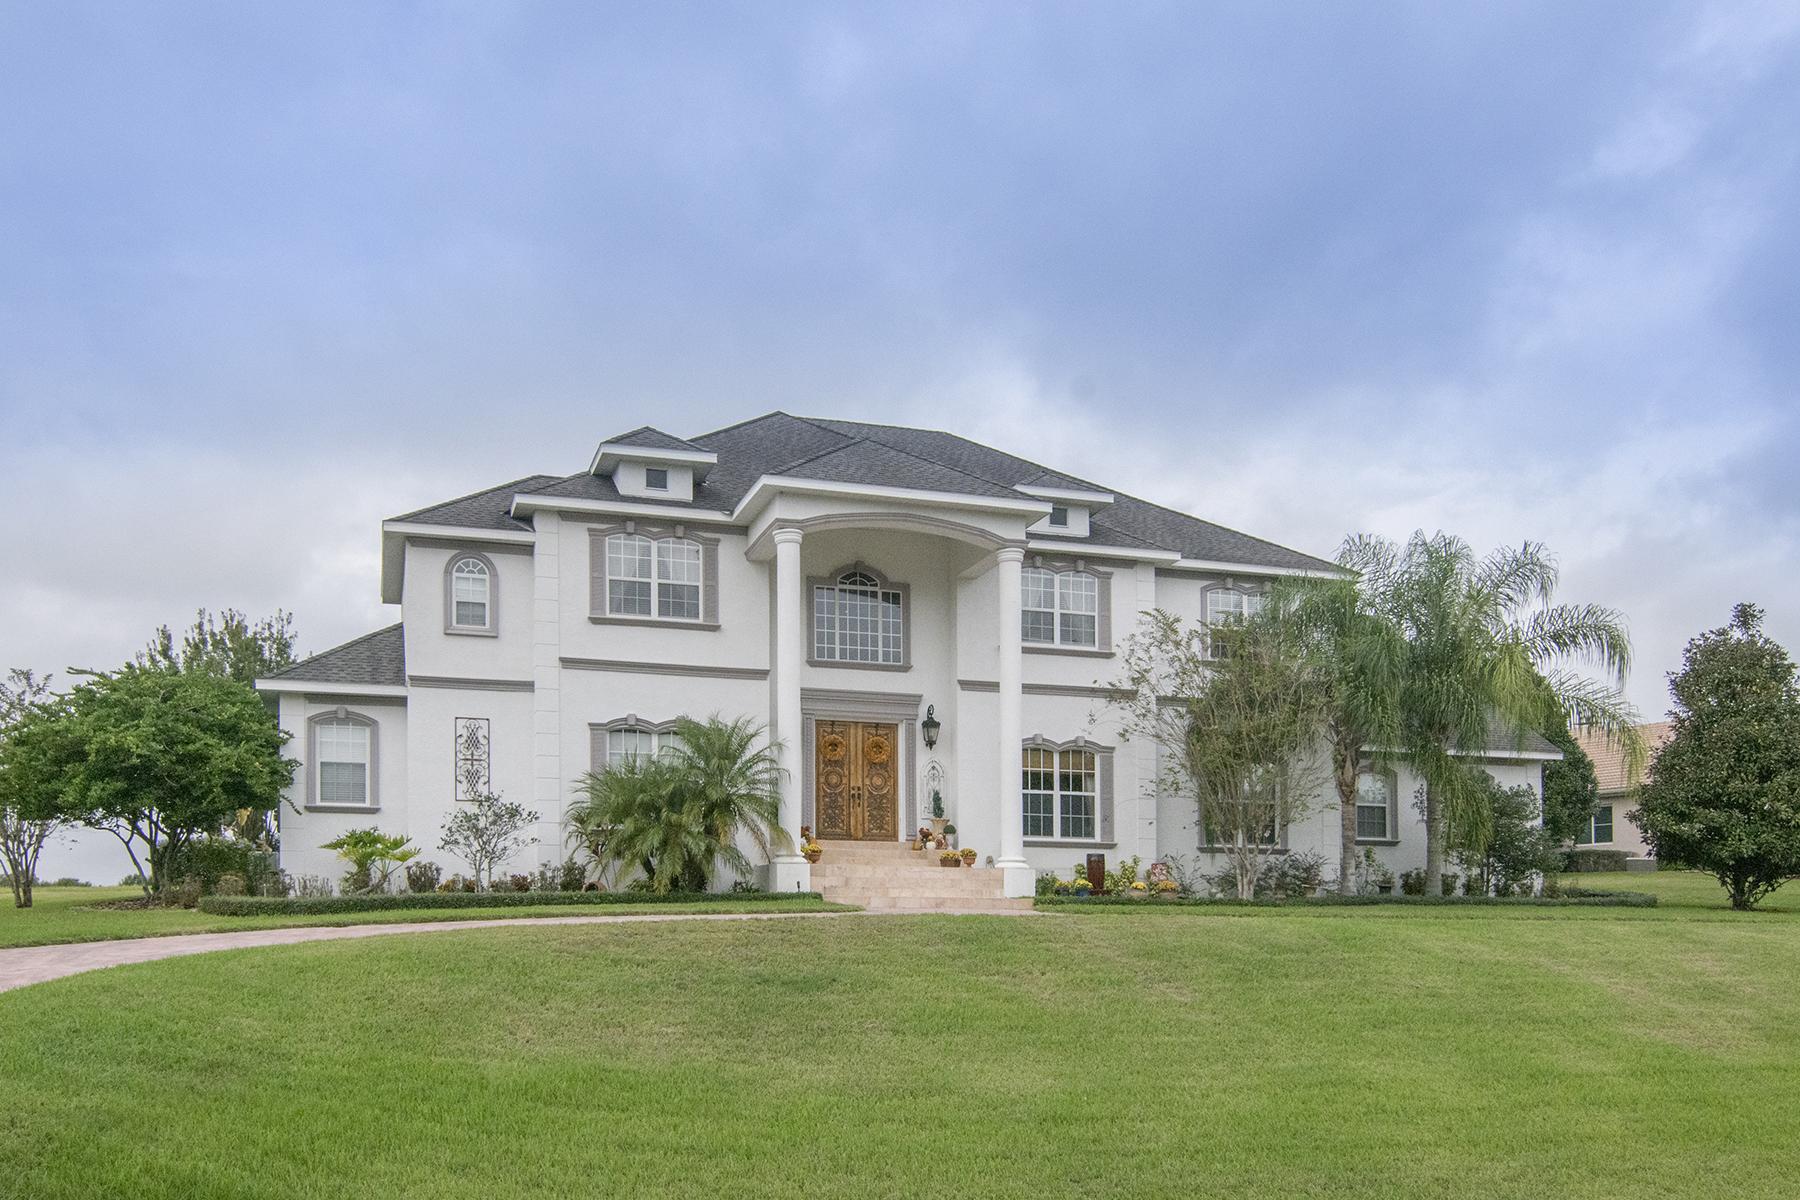 Single Family Home for Sale at LAKE JOVITA 12851 Ventana Ct Dade City, Florida, 33525 United States